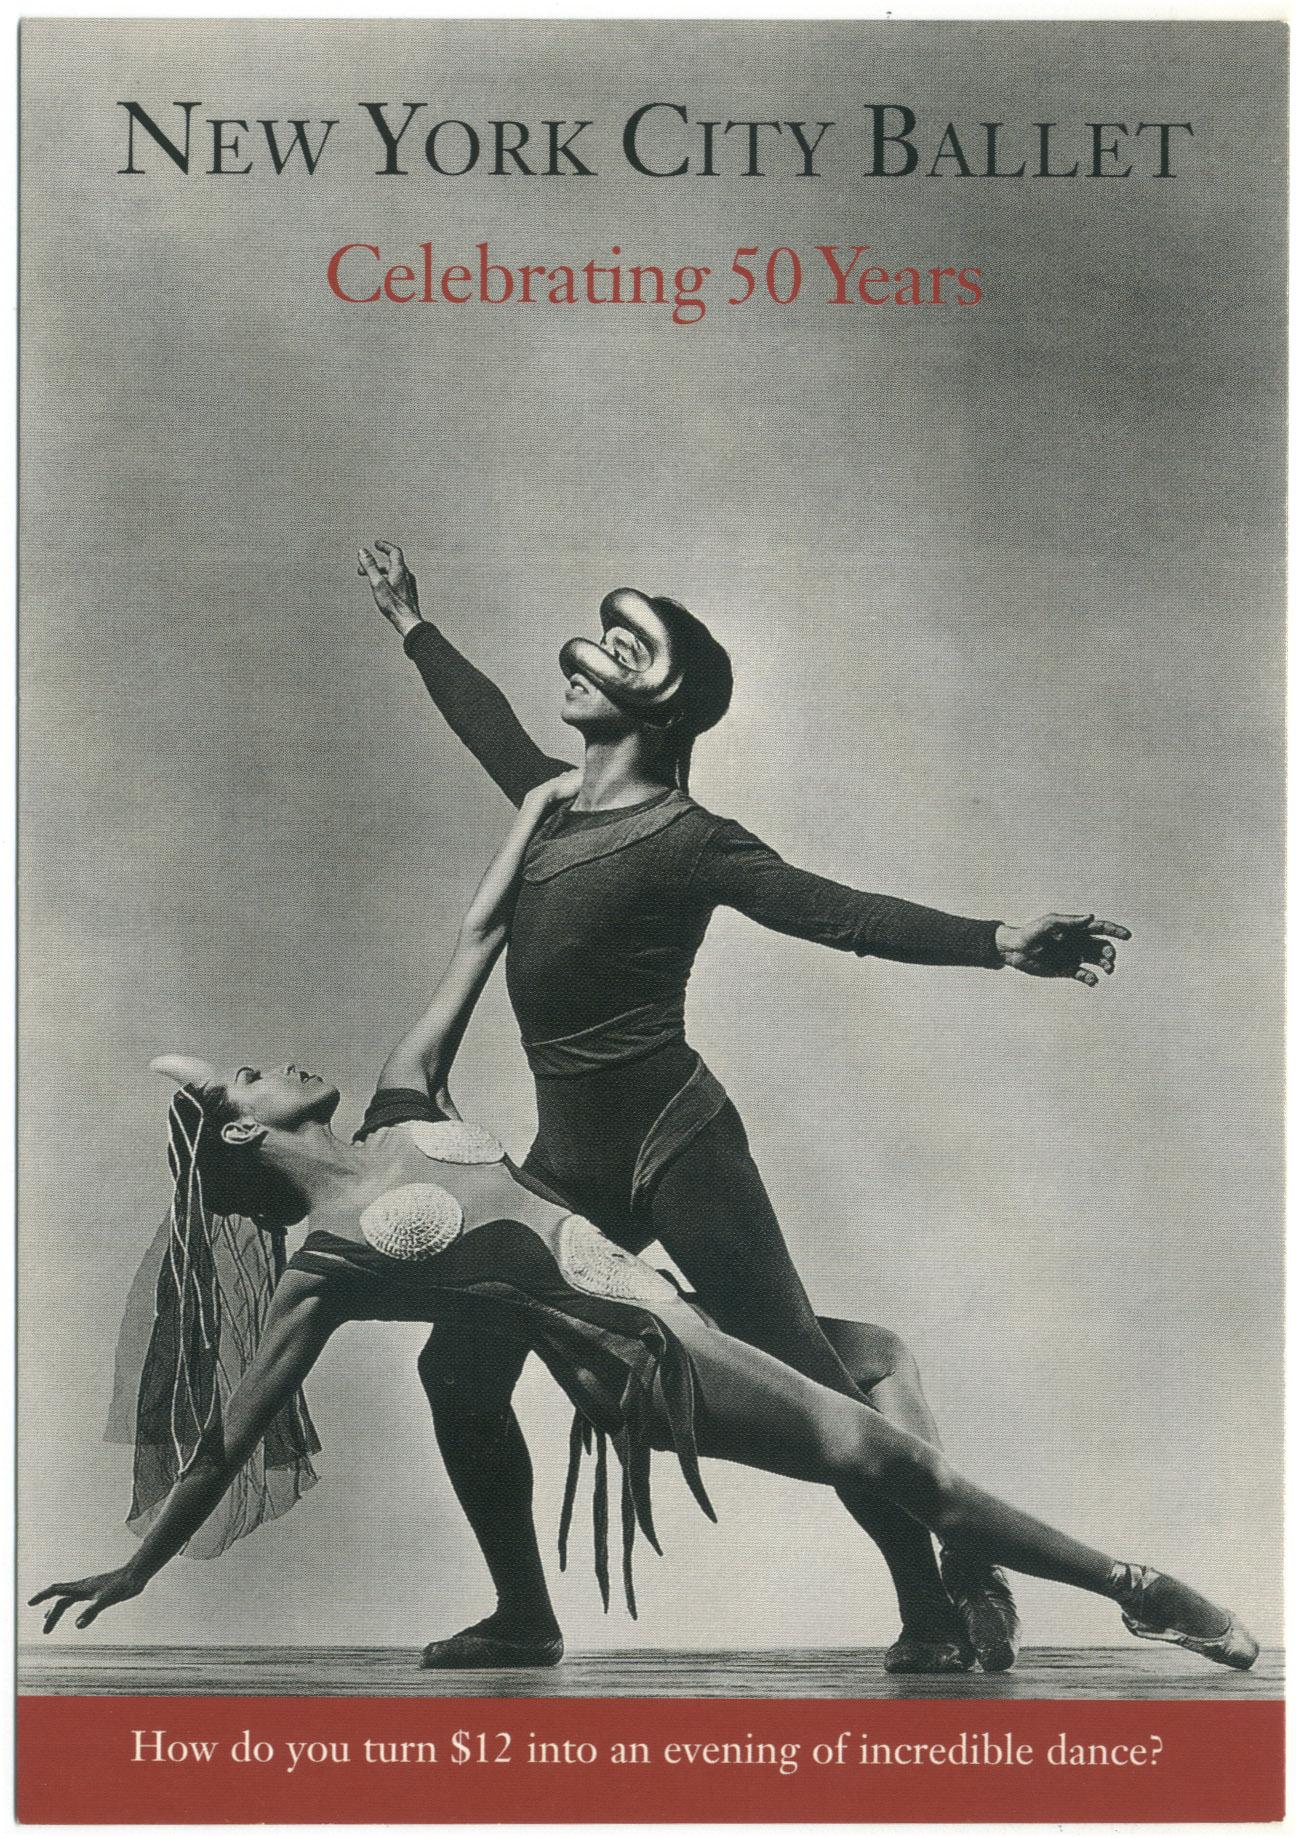 1000 images about ballet maria tallchief on pinterest. Black Bedroom Furniture Sets. Home Design Ideas